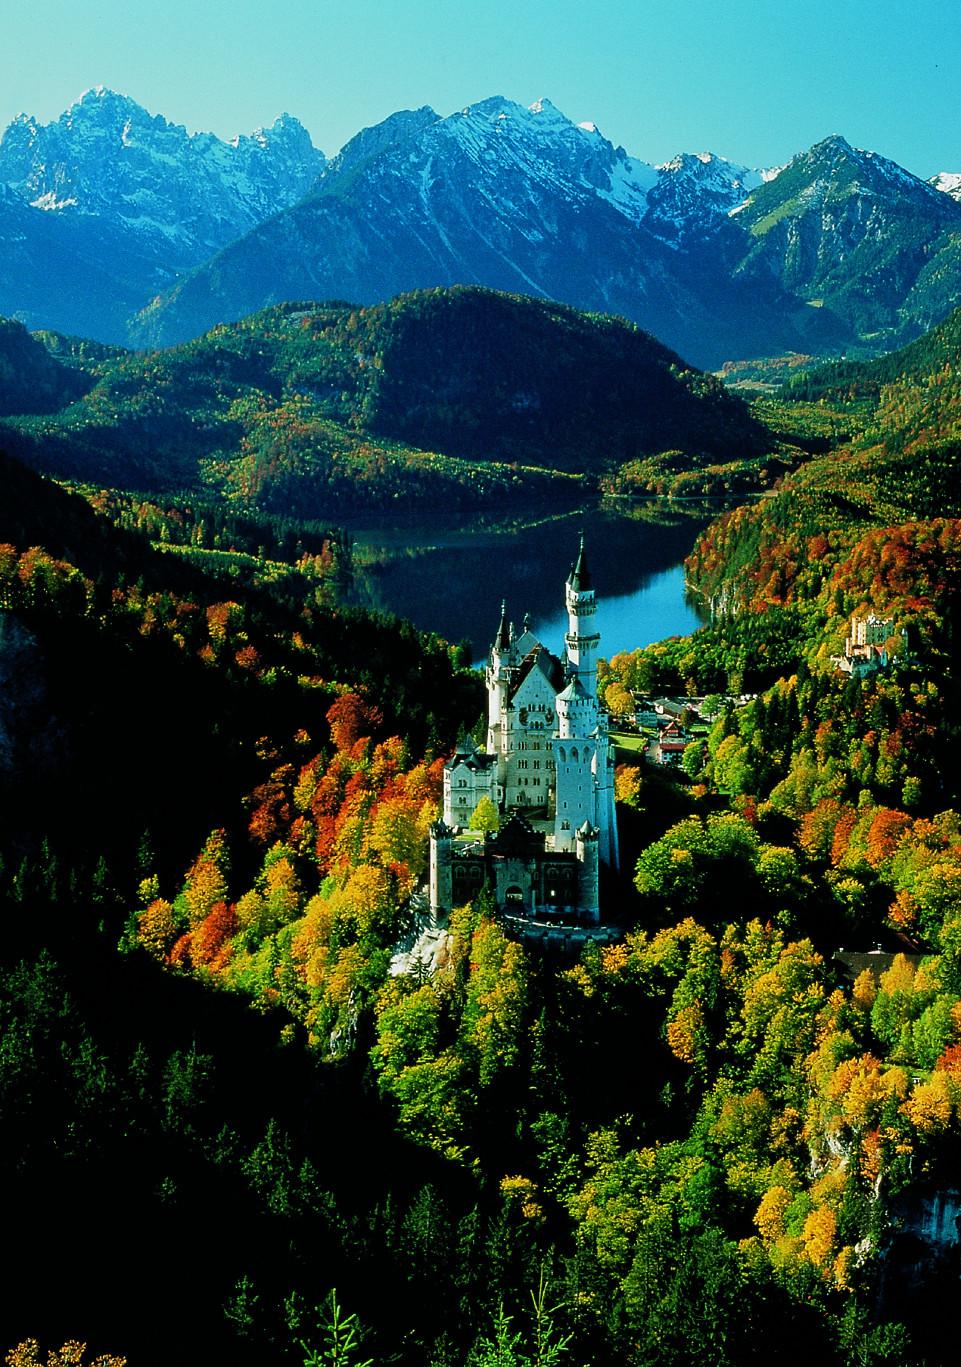 Upper Bavaria A Charming Region In The German Alps